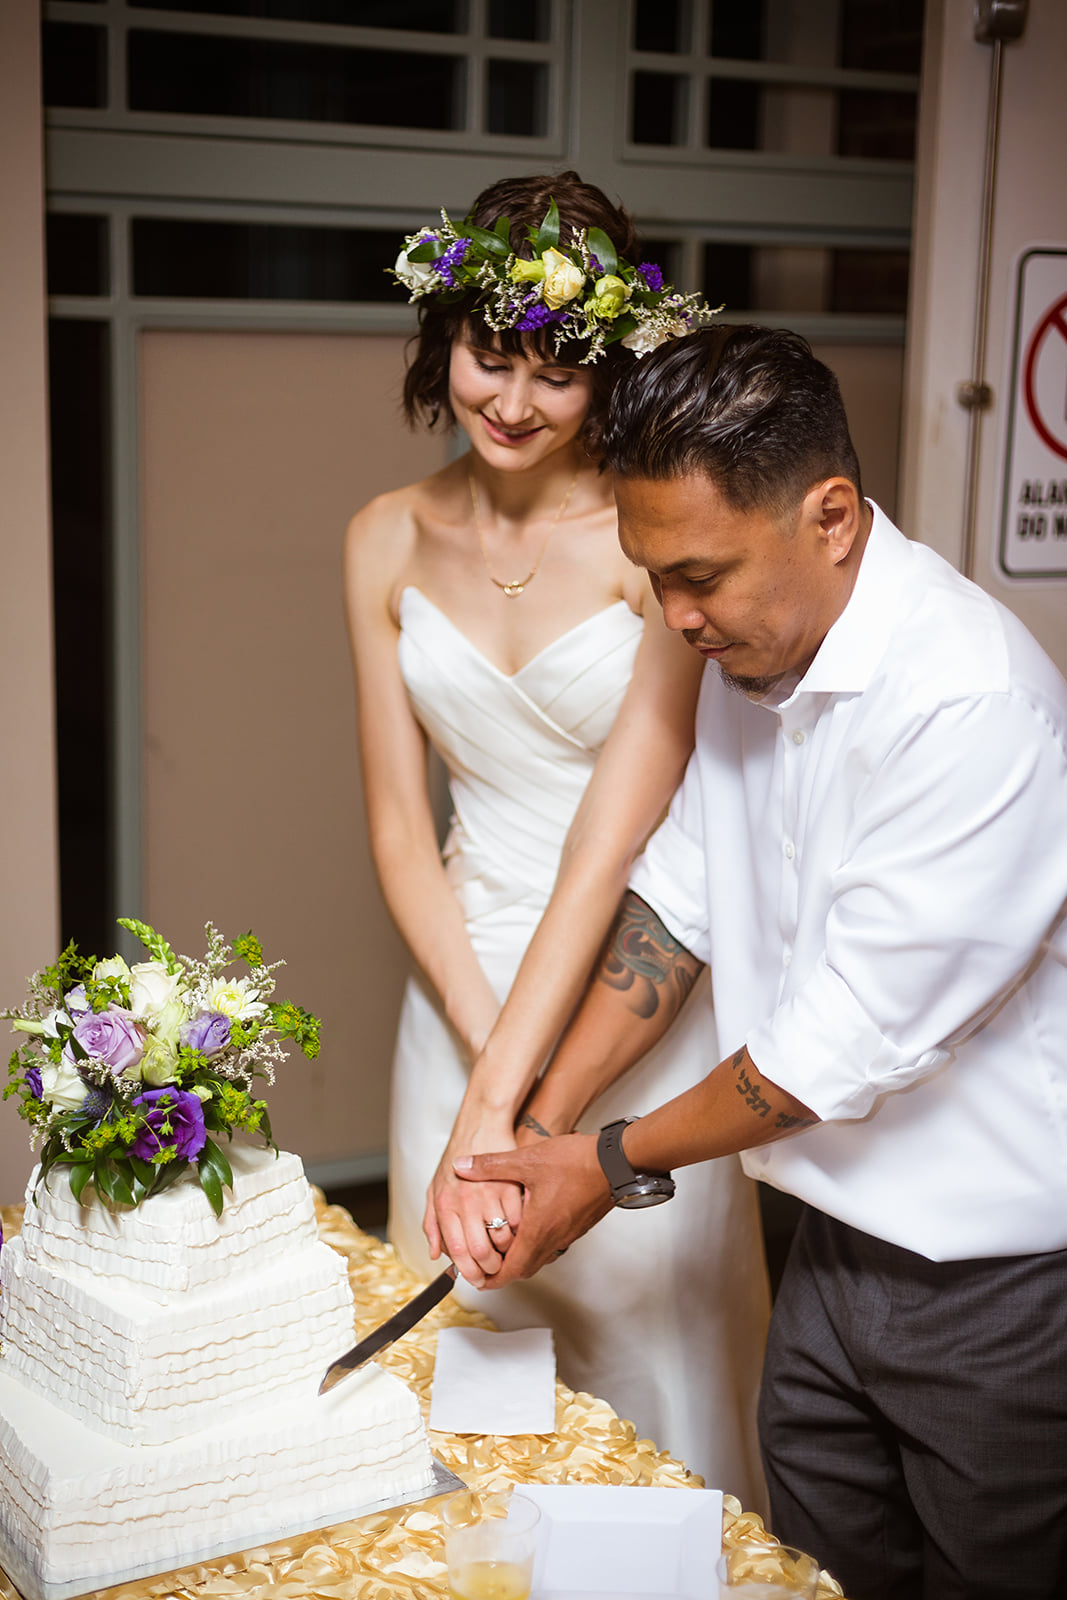 Blacano Wedding - Reception-64.jpg